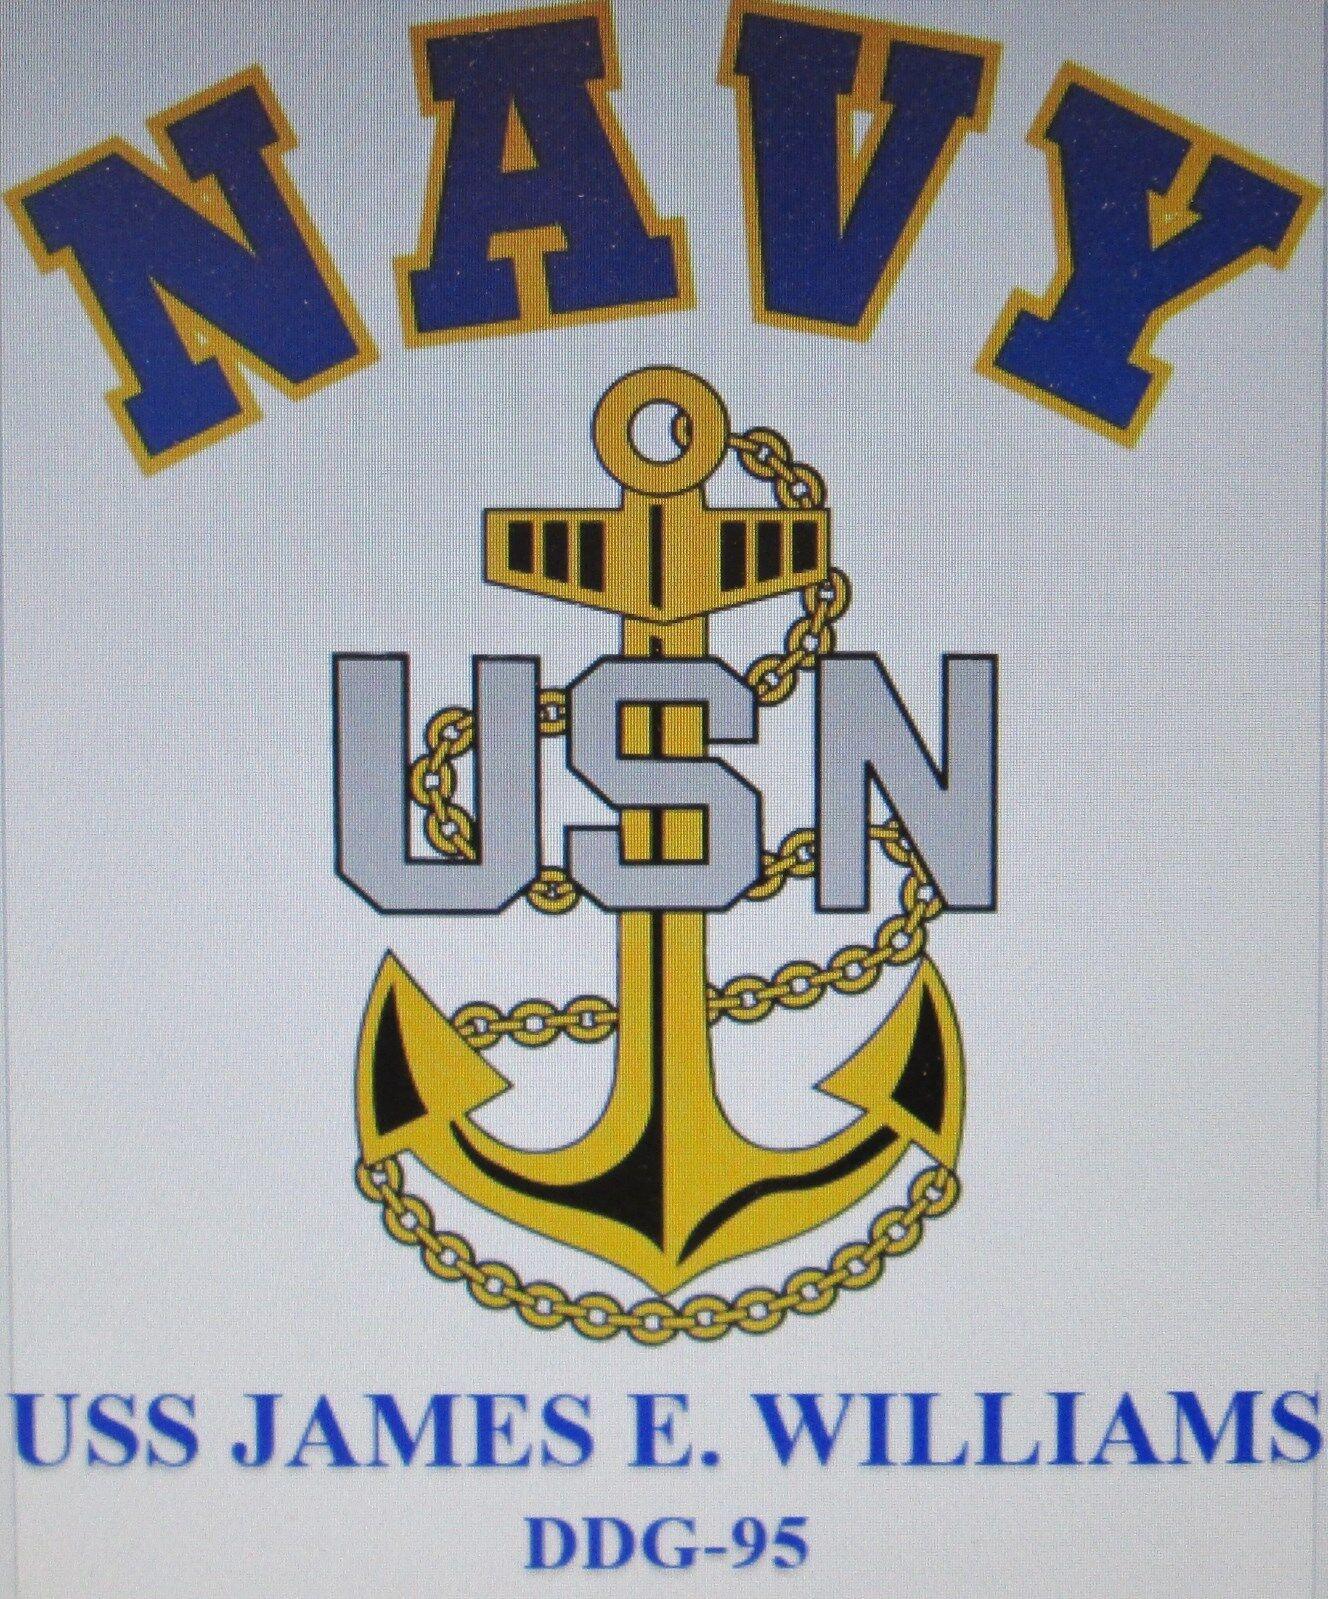 US USN Navy USS Chung-Hoon DDG-93 Destroyer T-Shirt